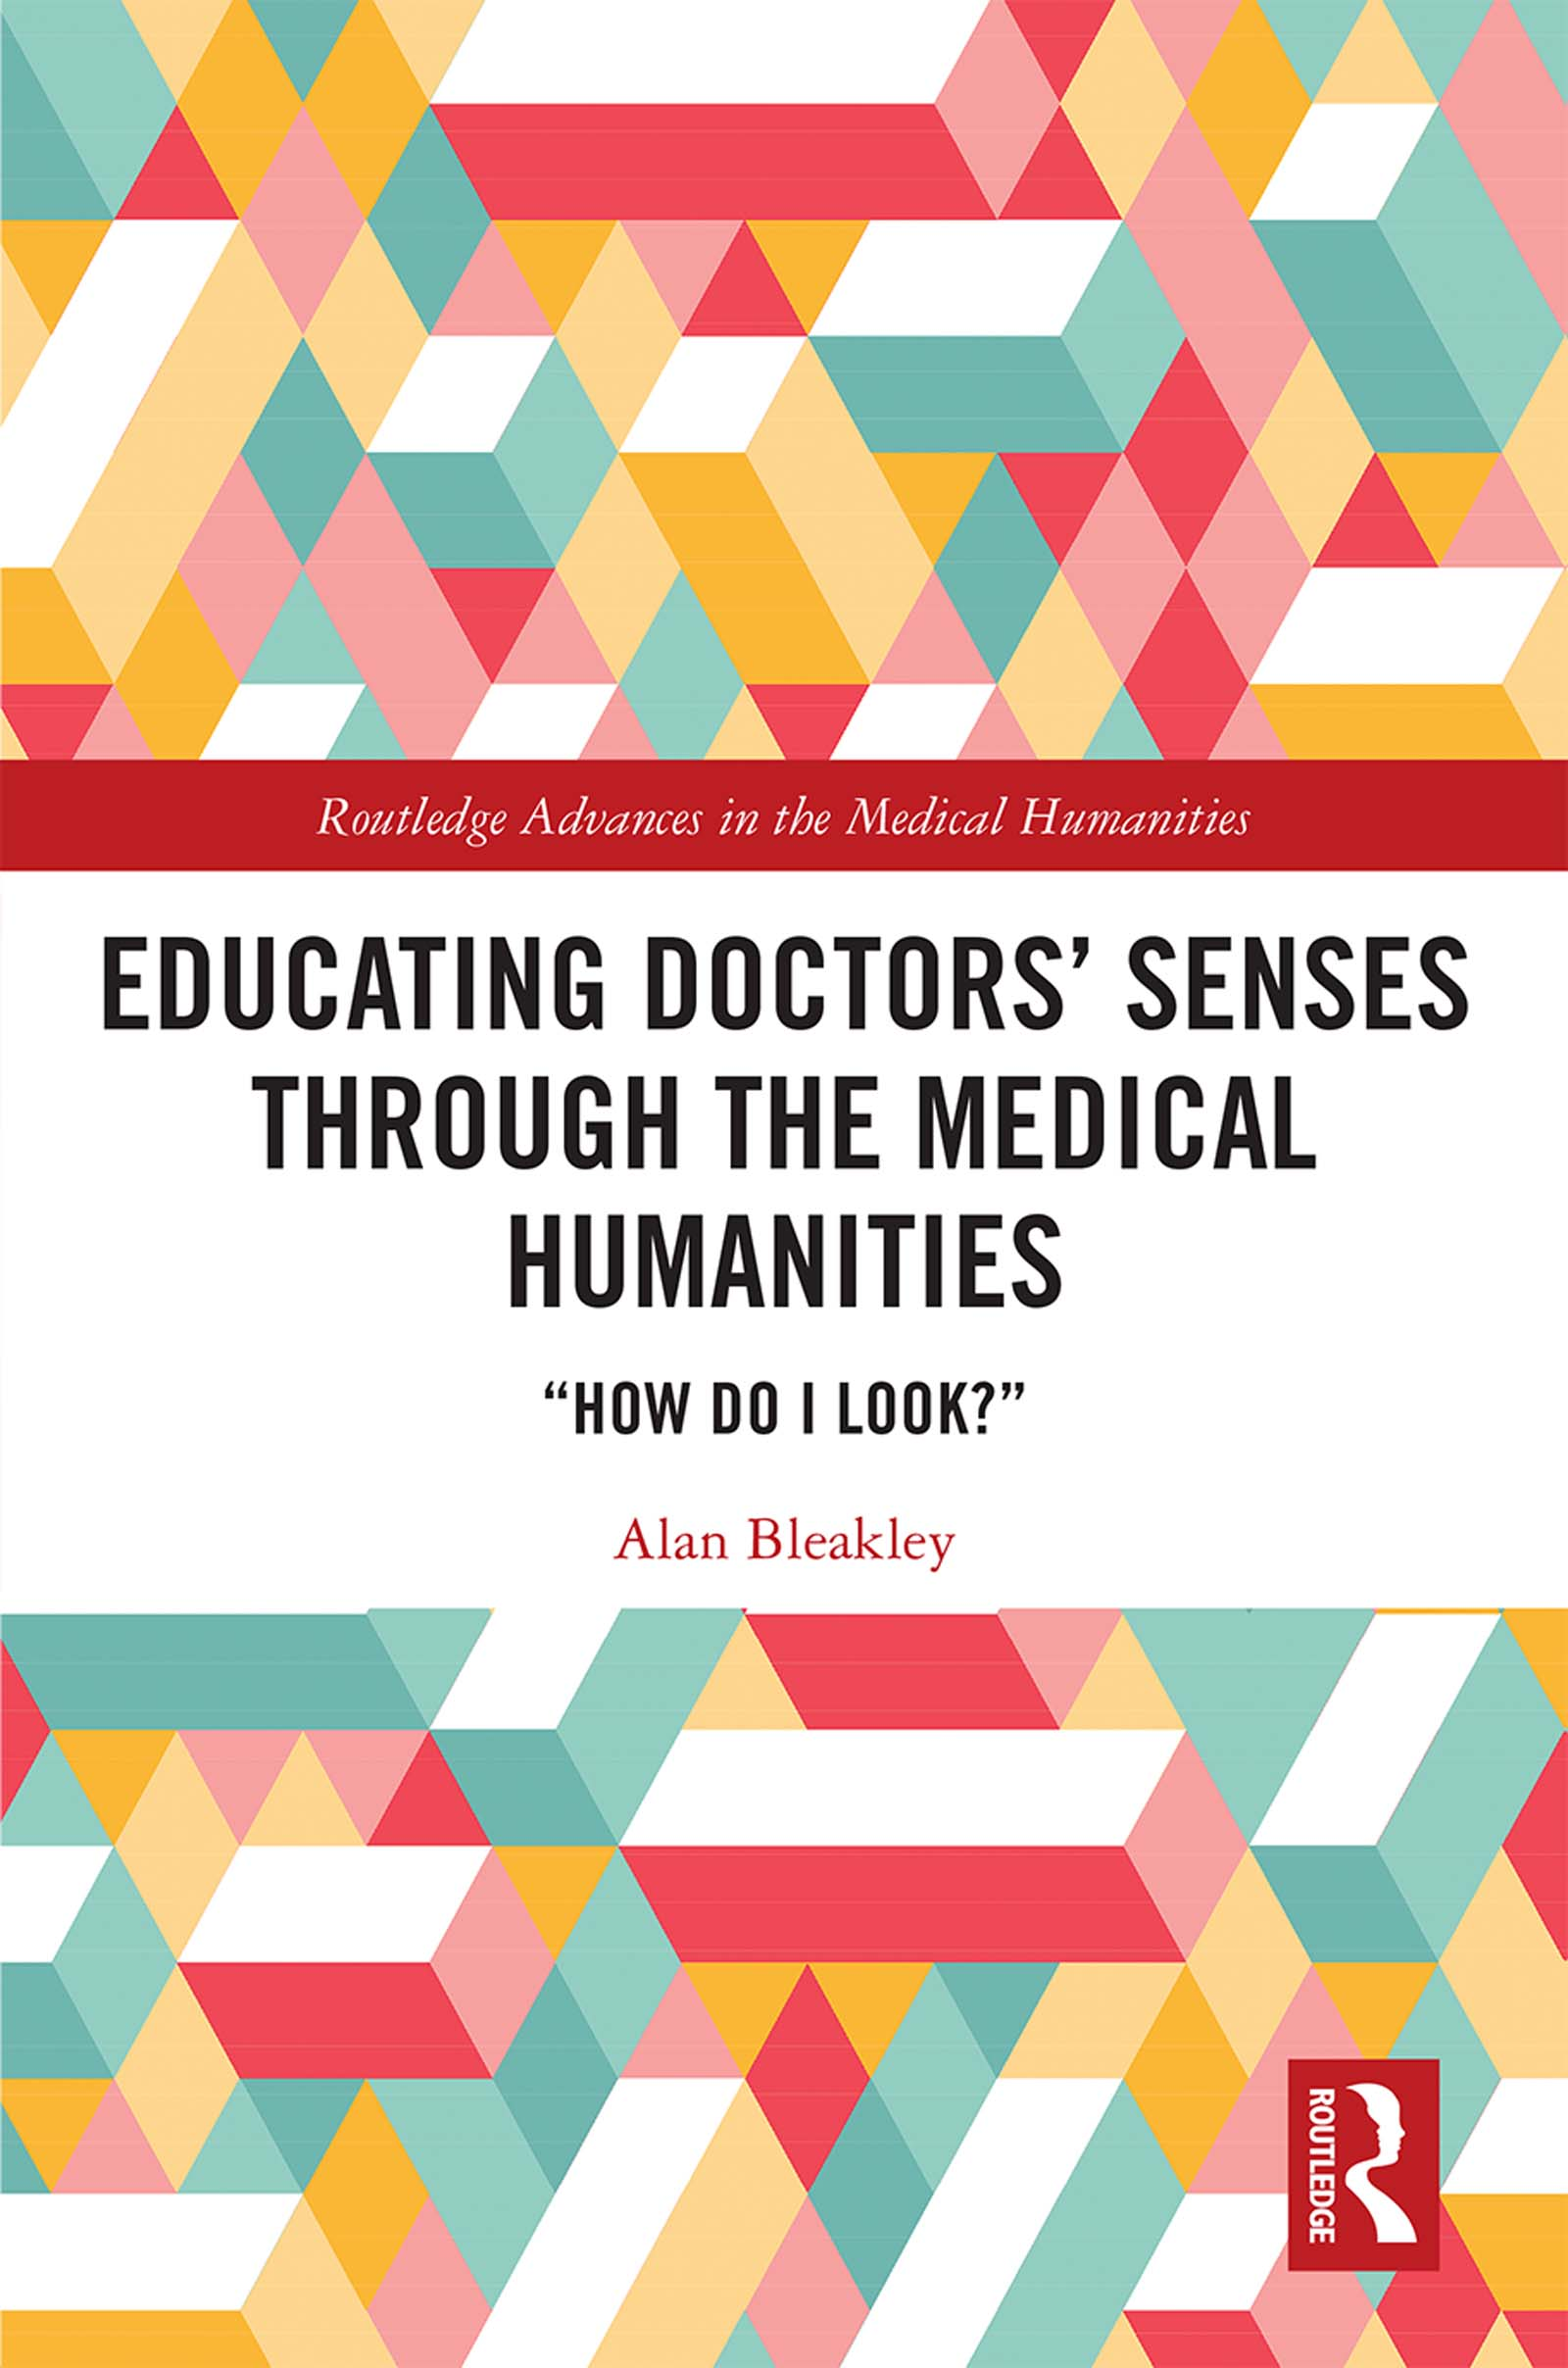 Educating Doctors' Senses Through the Medical Humanities: